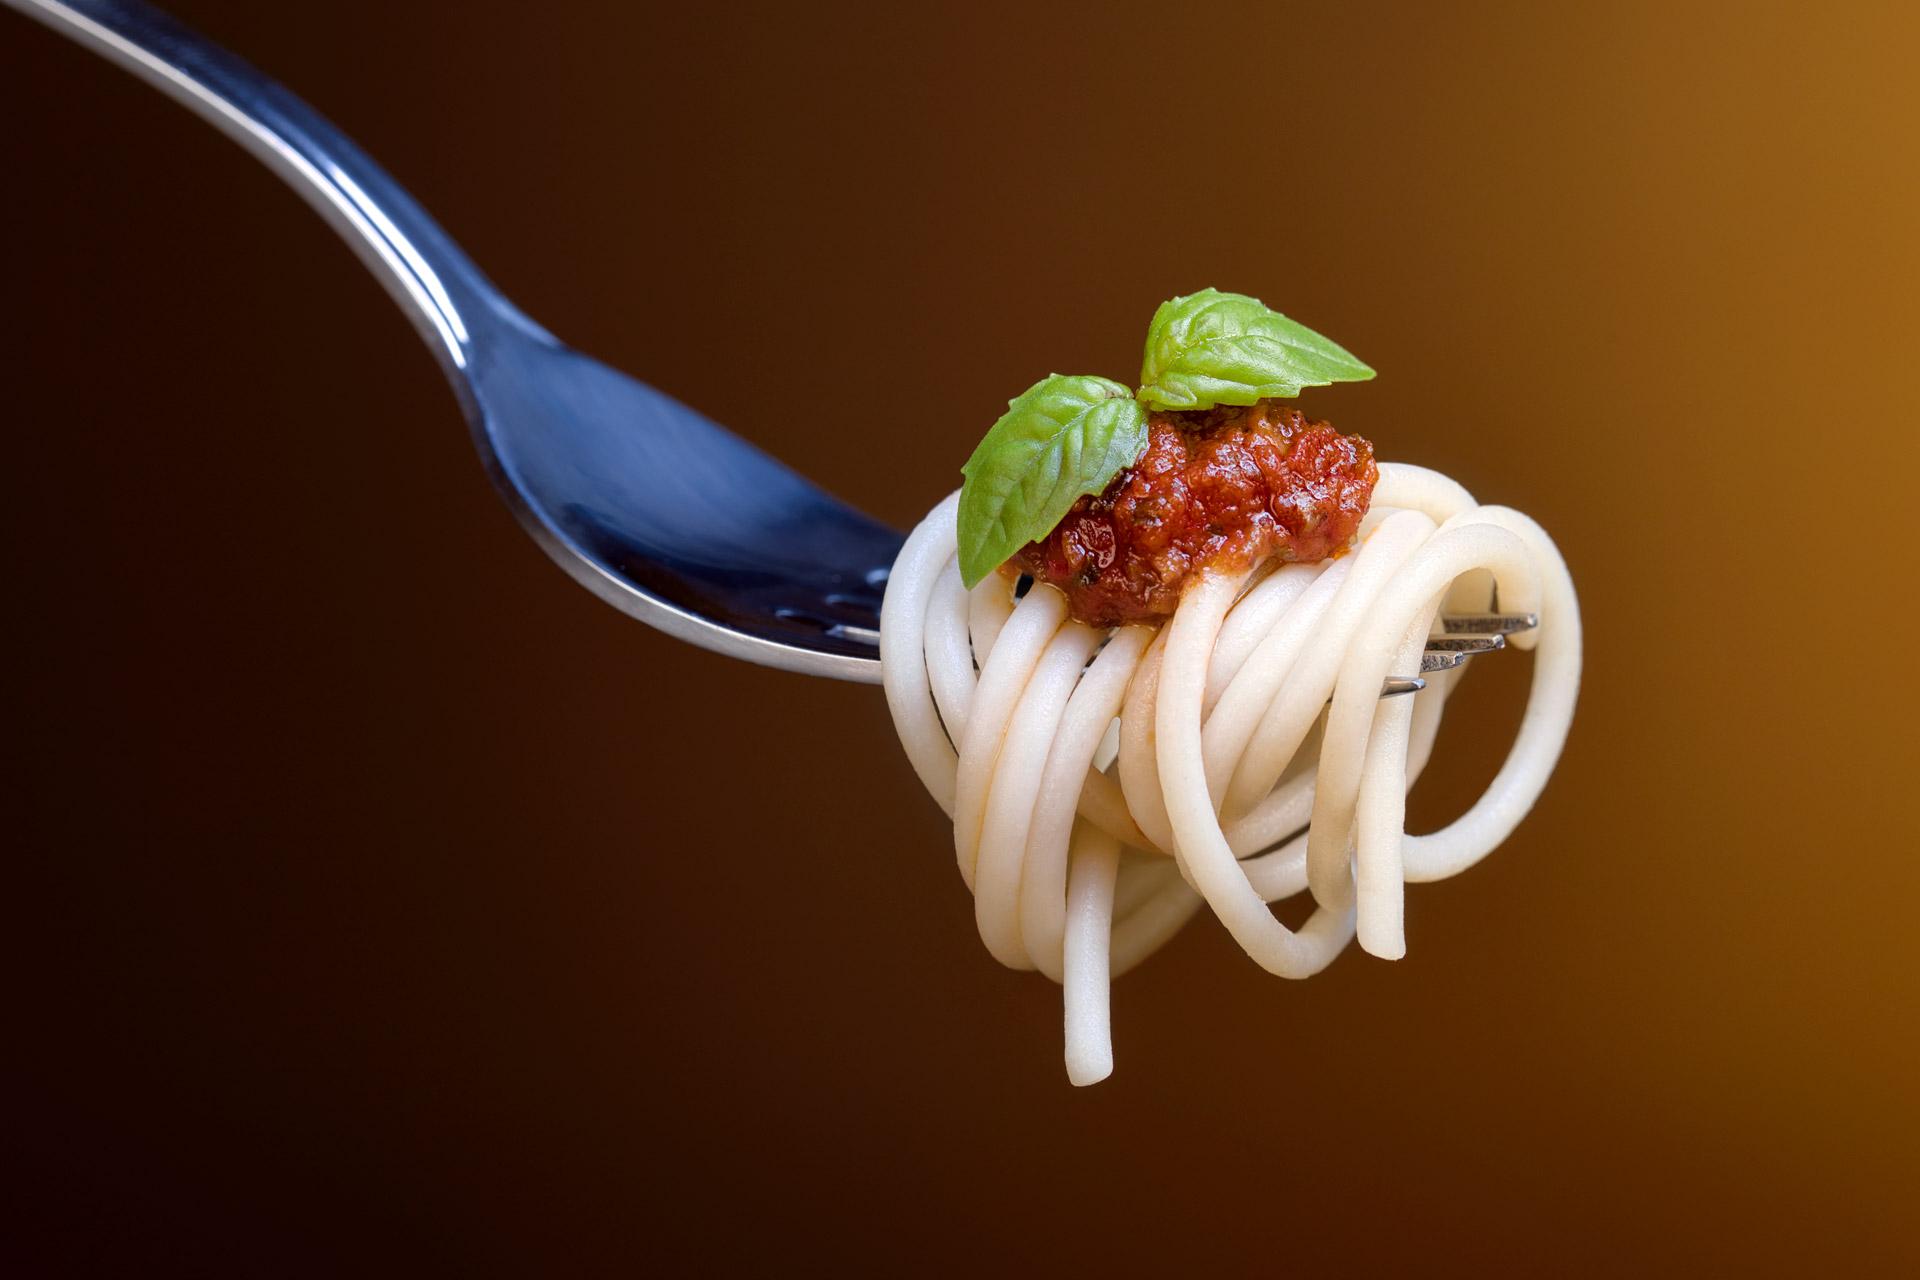 Spaghetti-175-Hartweizengriess-Bio-Stillife-ksg